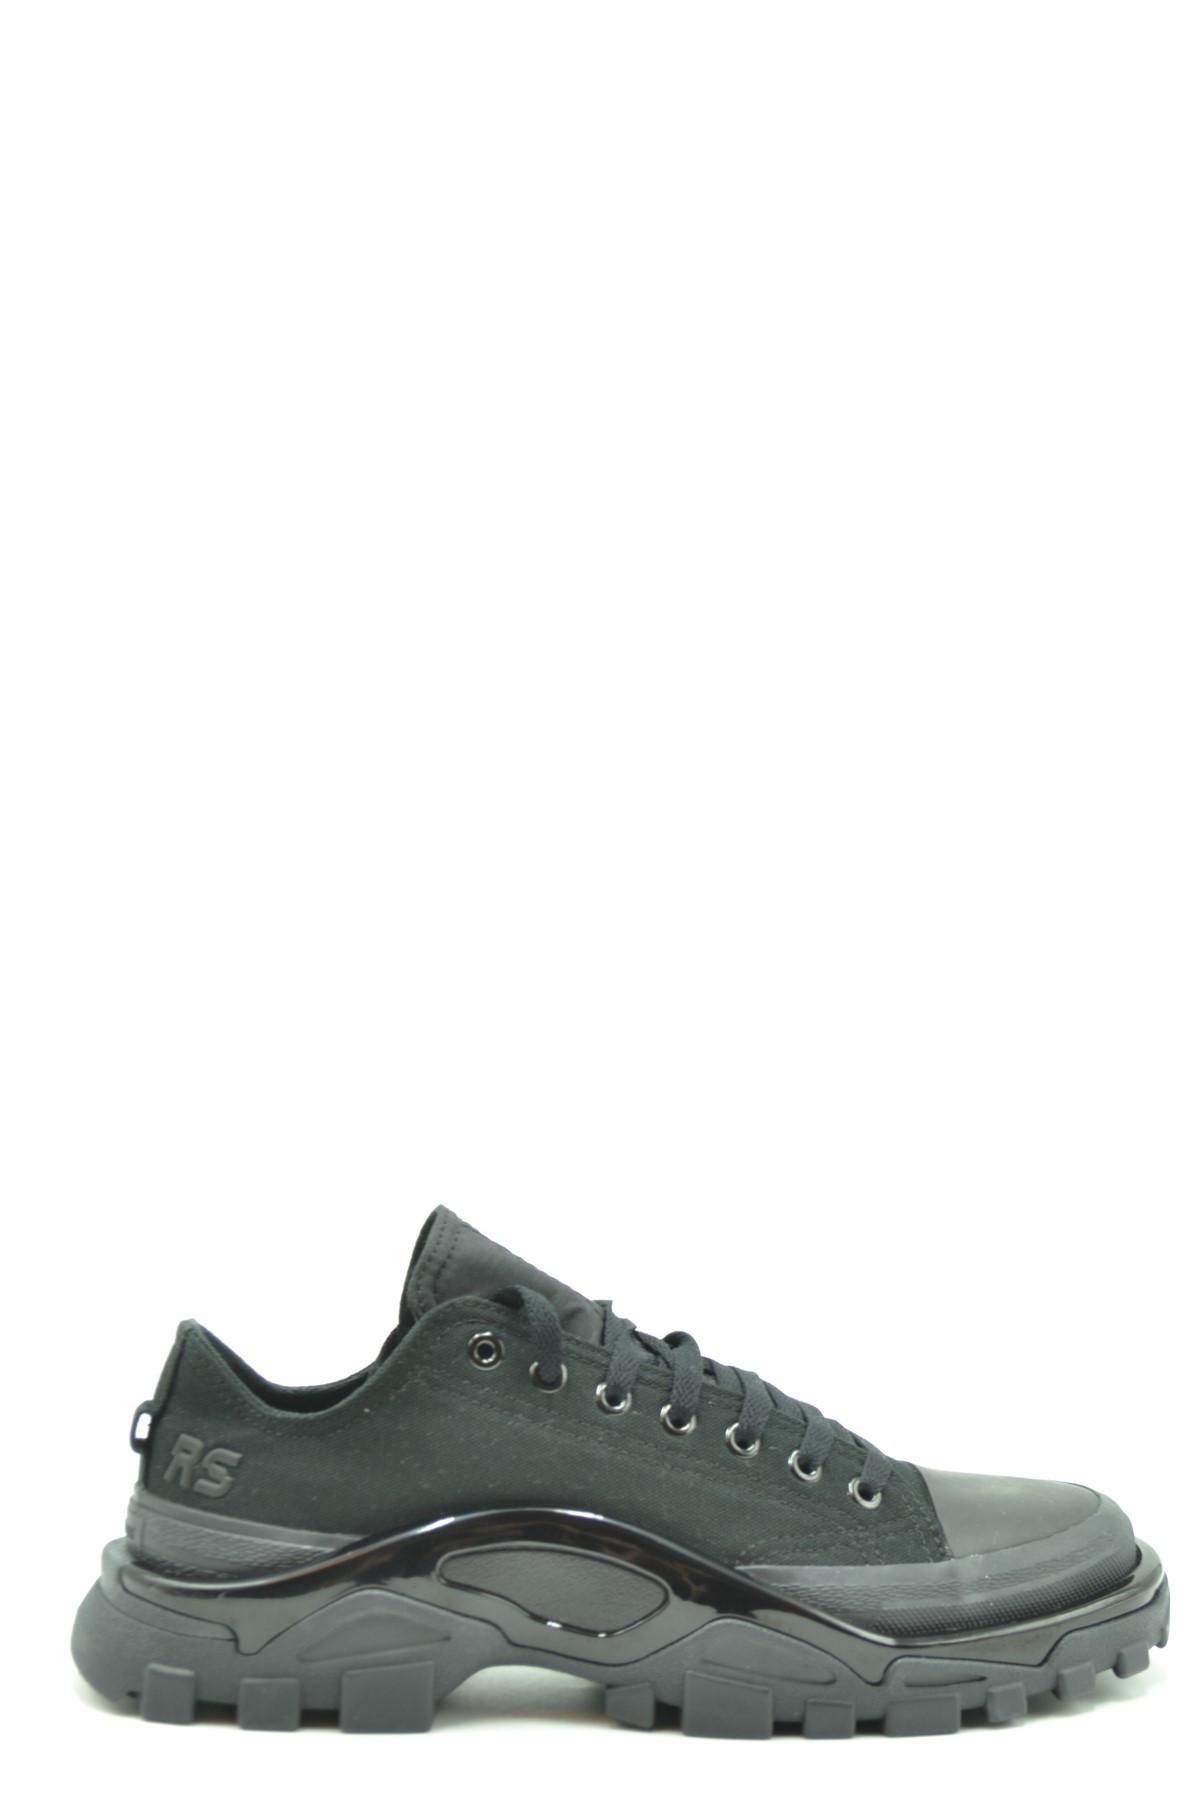 adidas raf simonsMarchio: Adidas Raf Simons; Genere: ; Tipologia: …